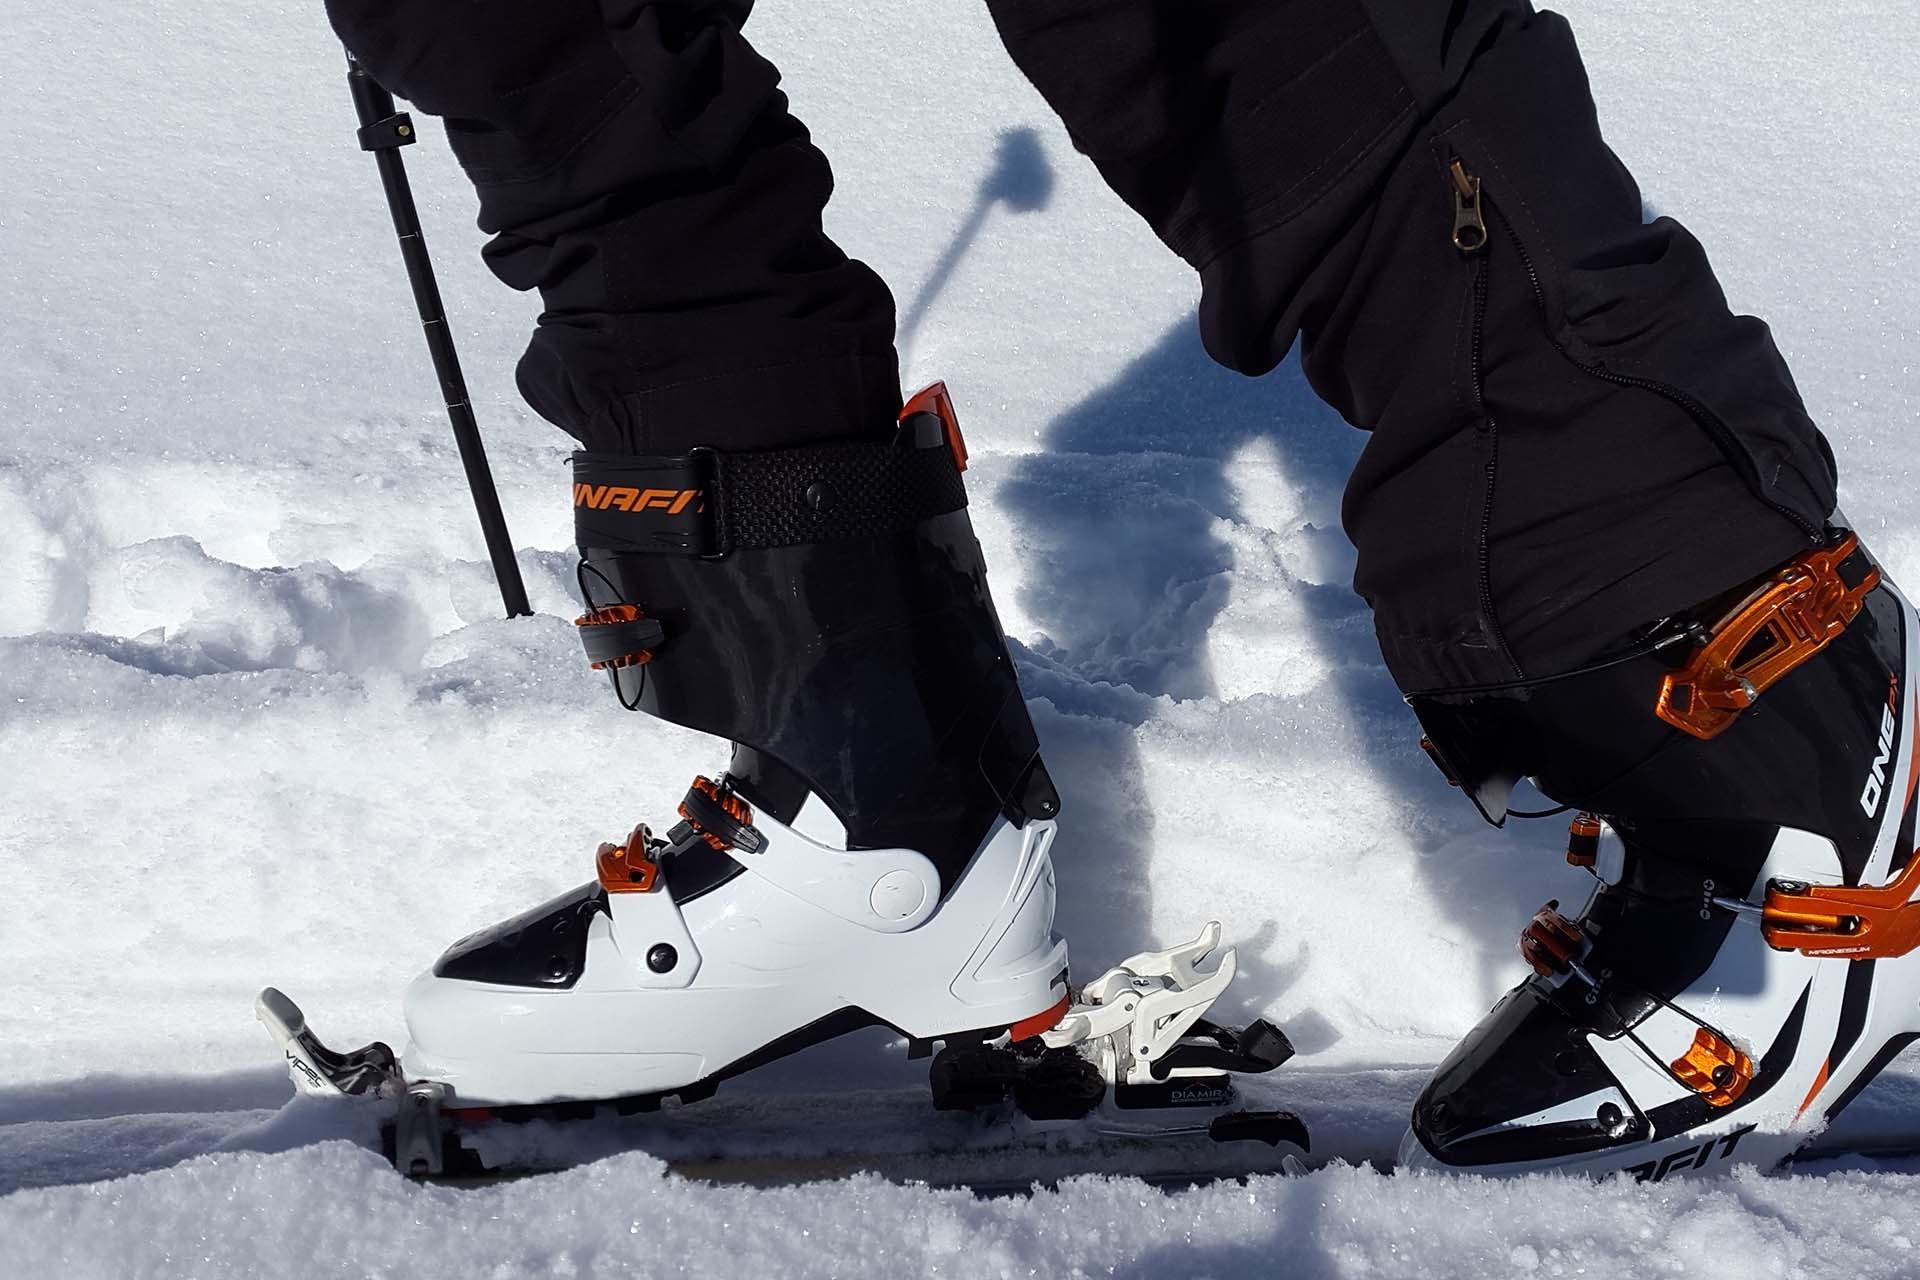 Location de ski de randonnée